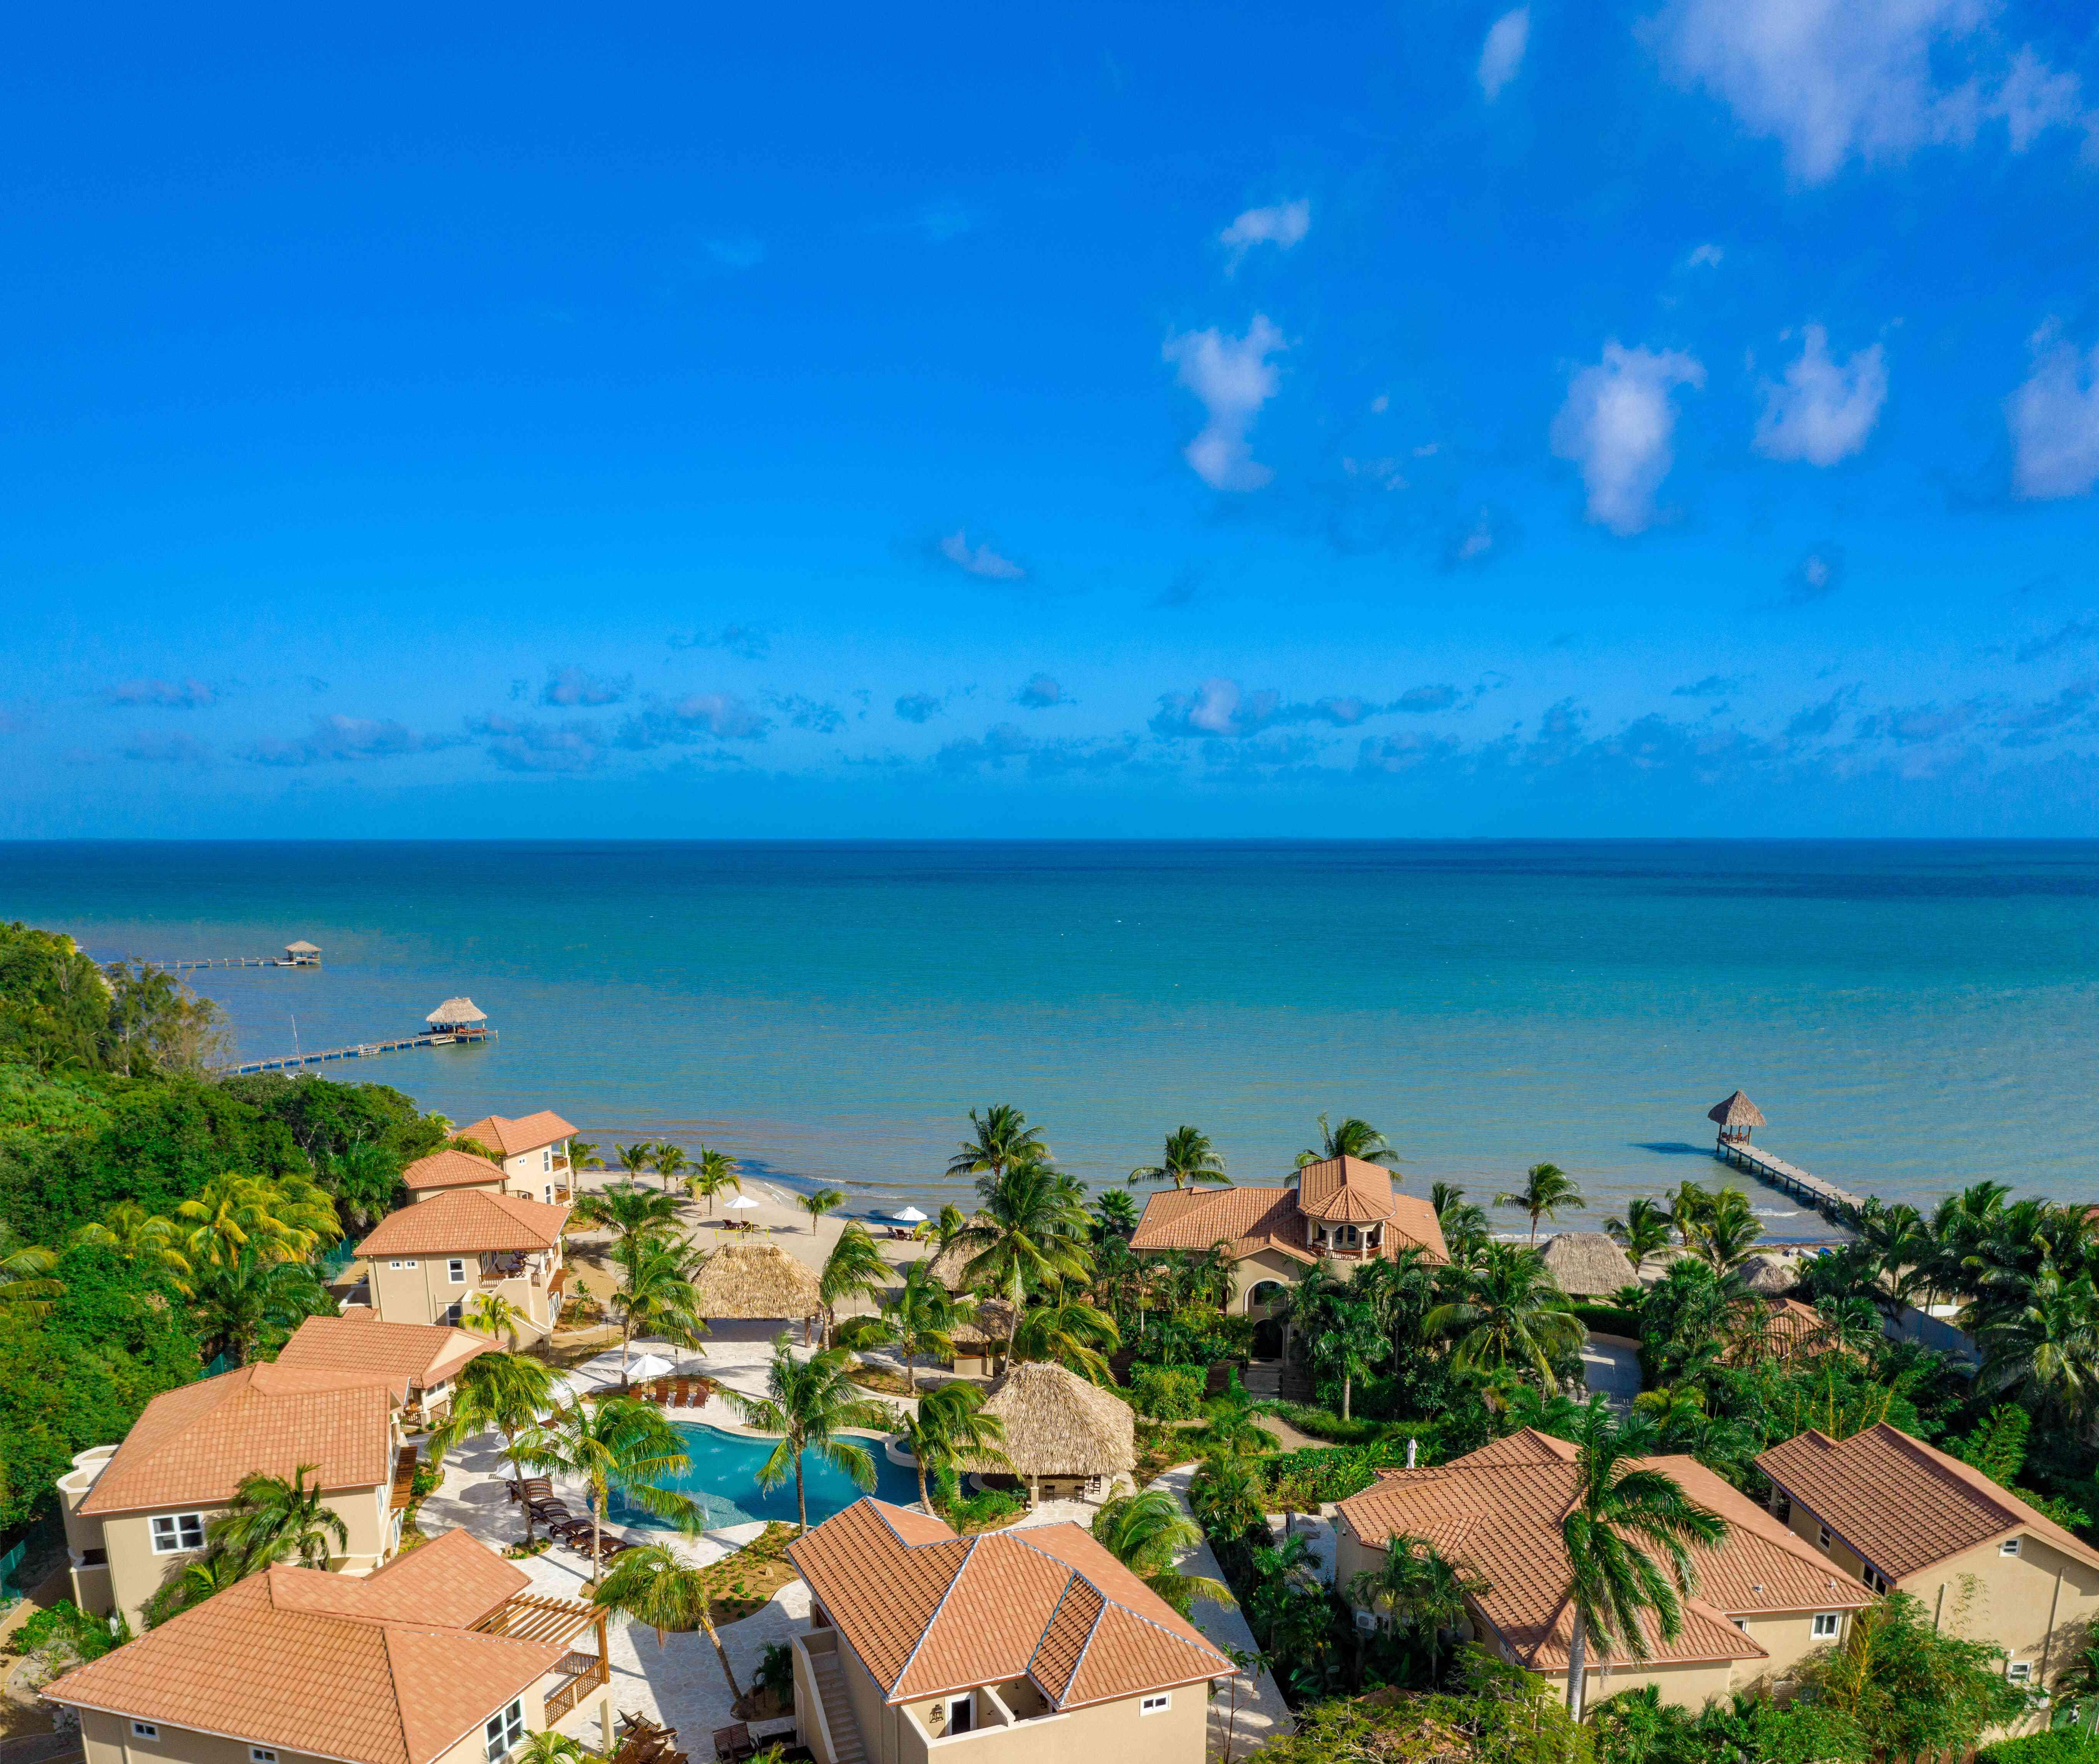 Aeriel view overlooking villas at Sirenian Bay in Belize